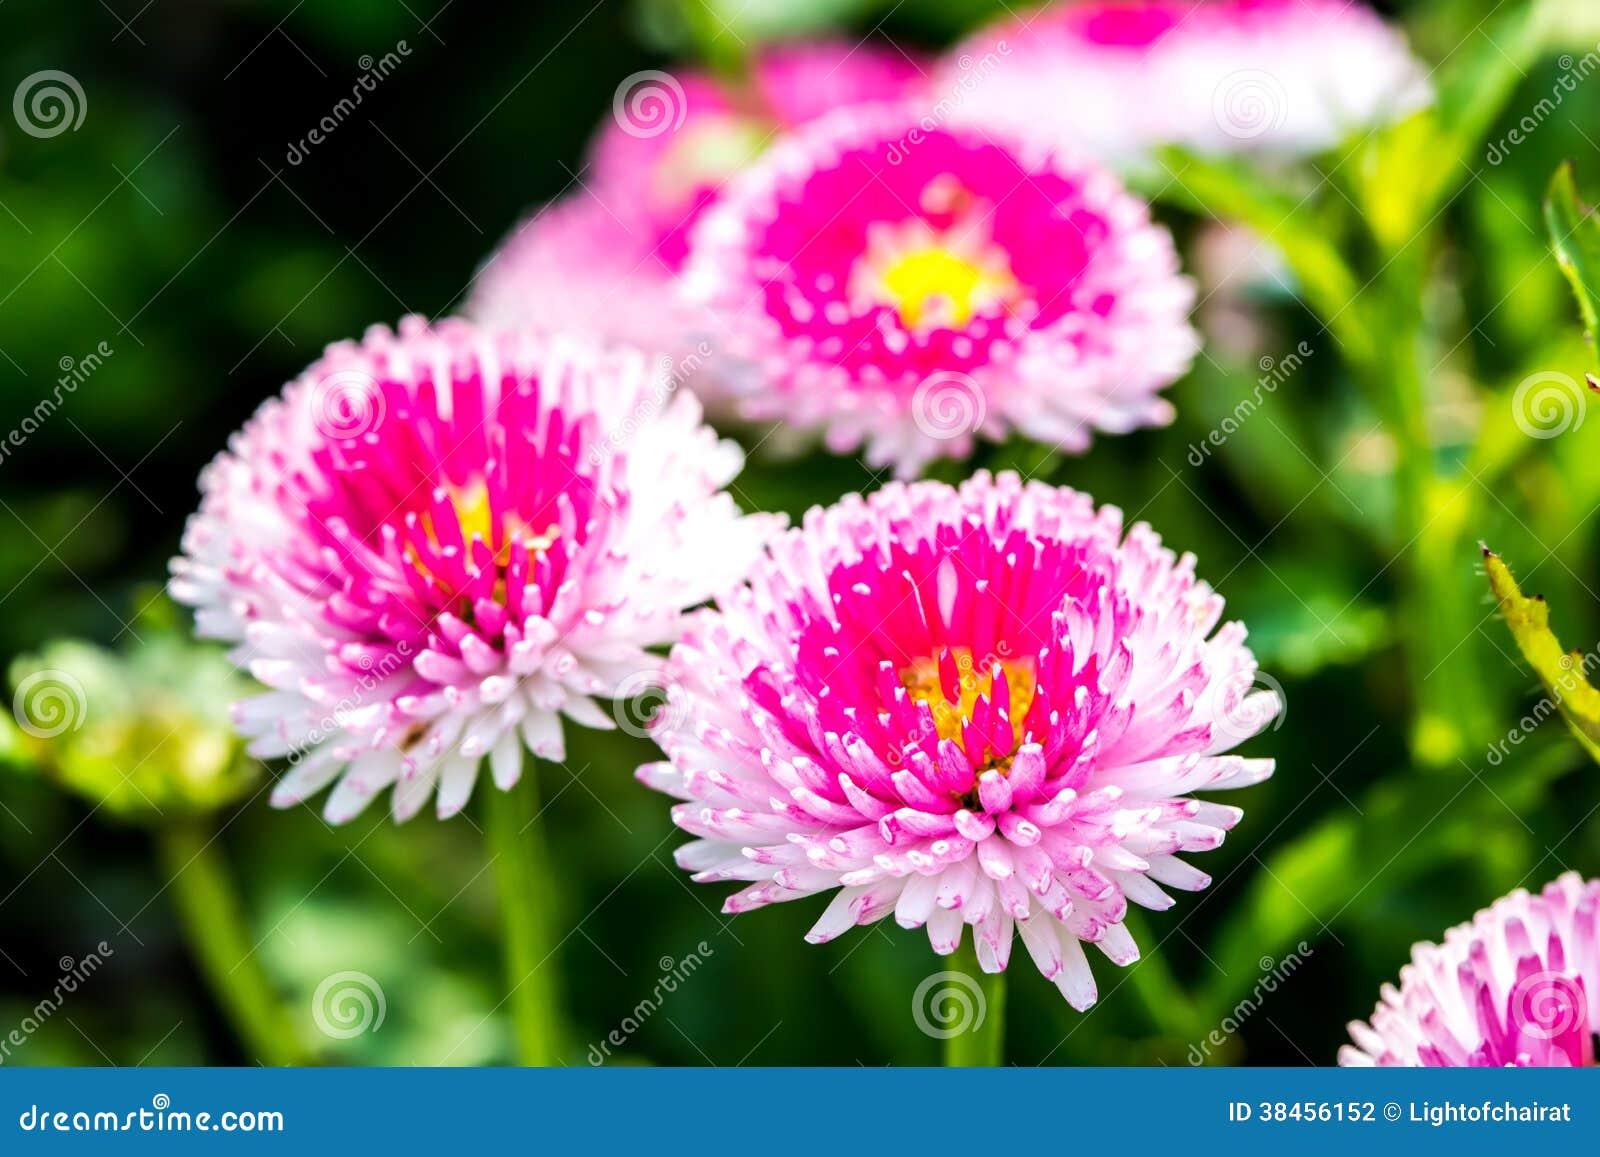 English daisy flower in chiangmai thailand stock photo image of download english daisy flower in chiangmai thailand stock photo image of fresh color izmirmasajfo